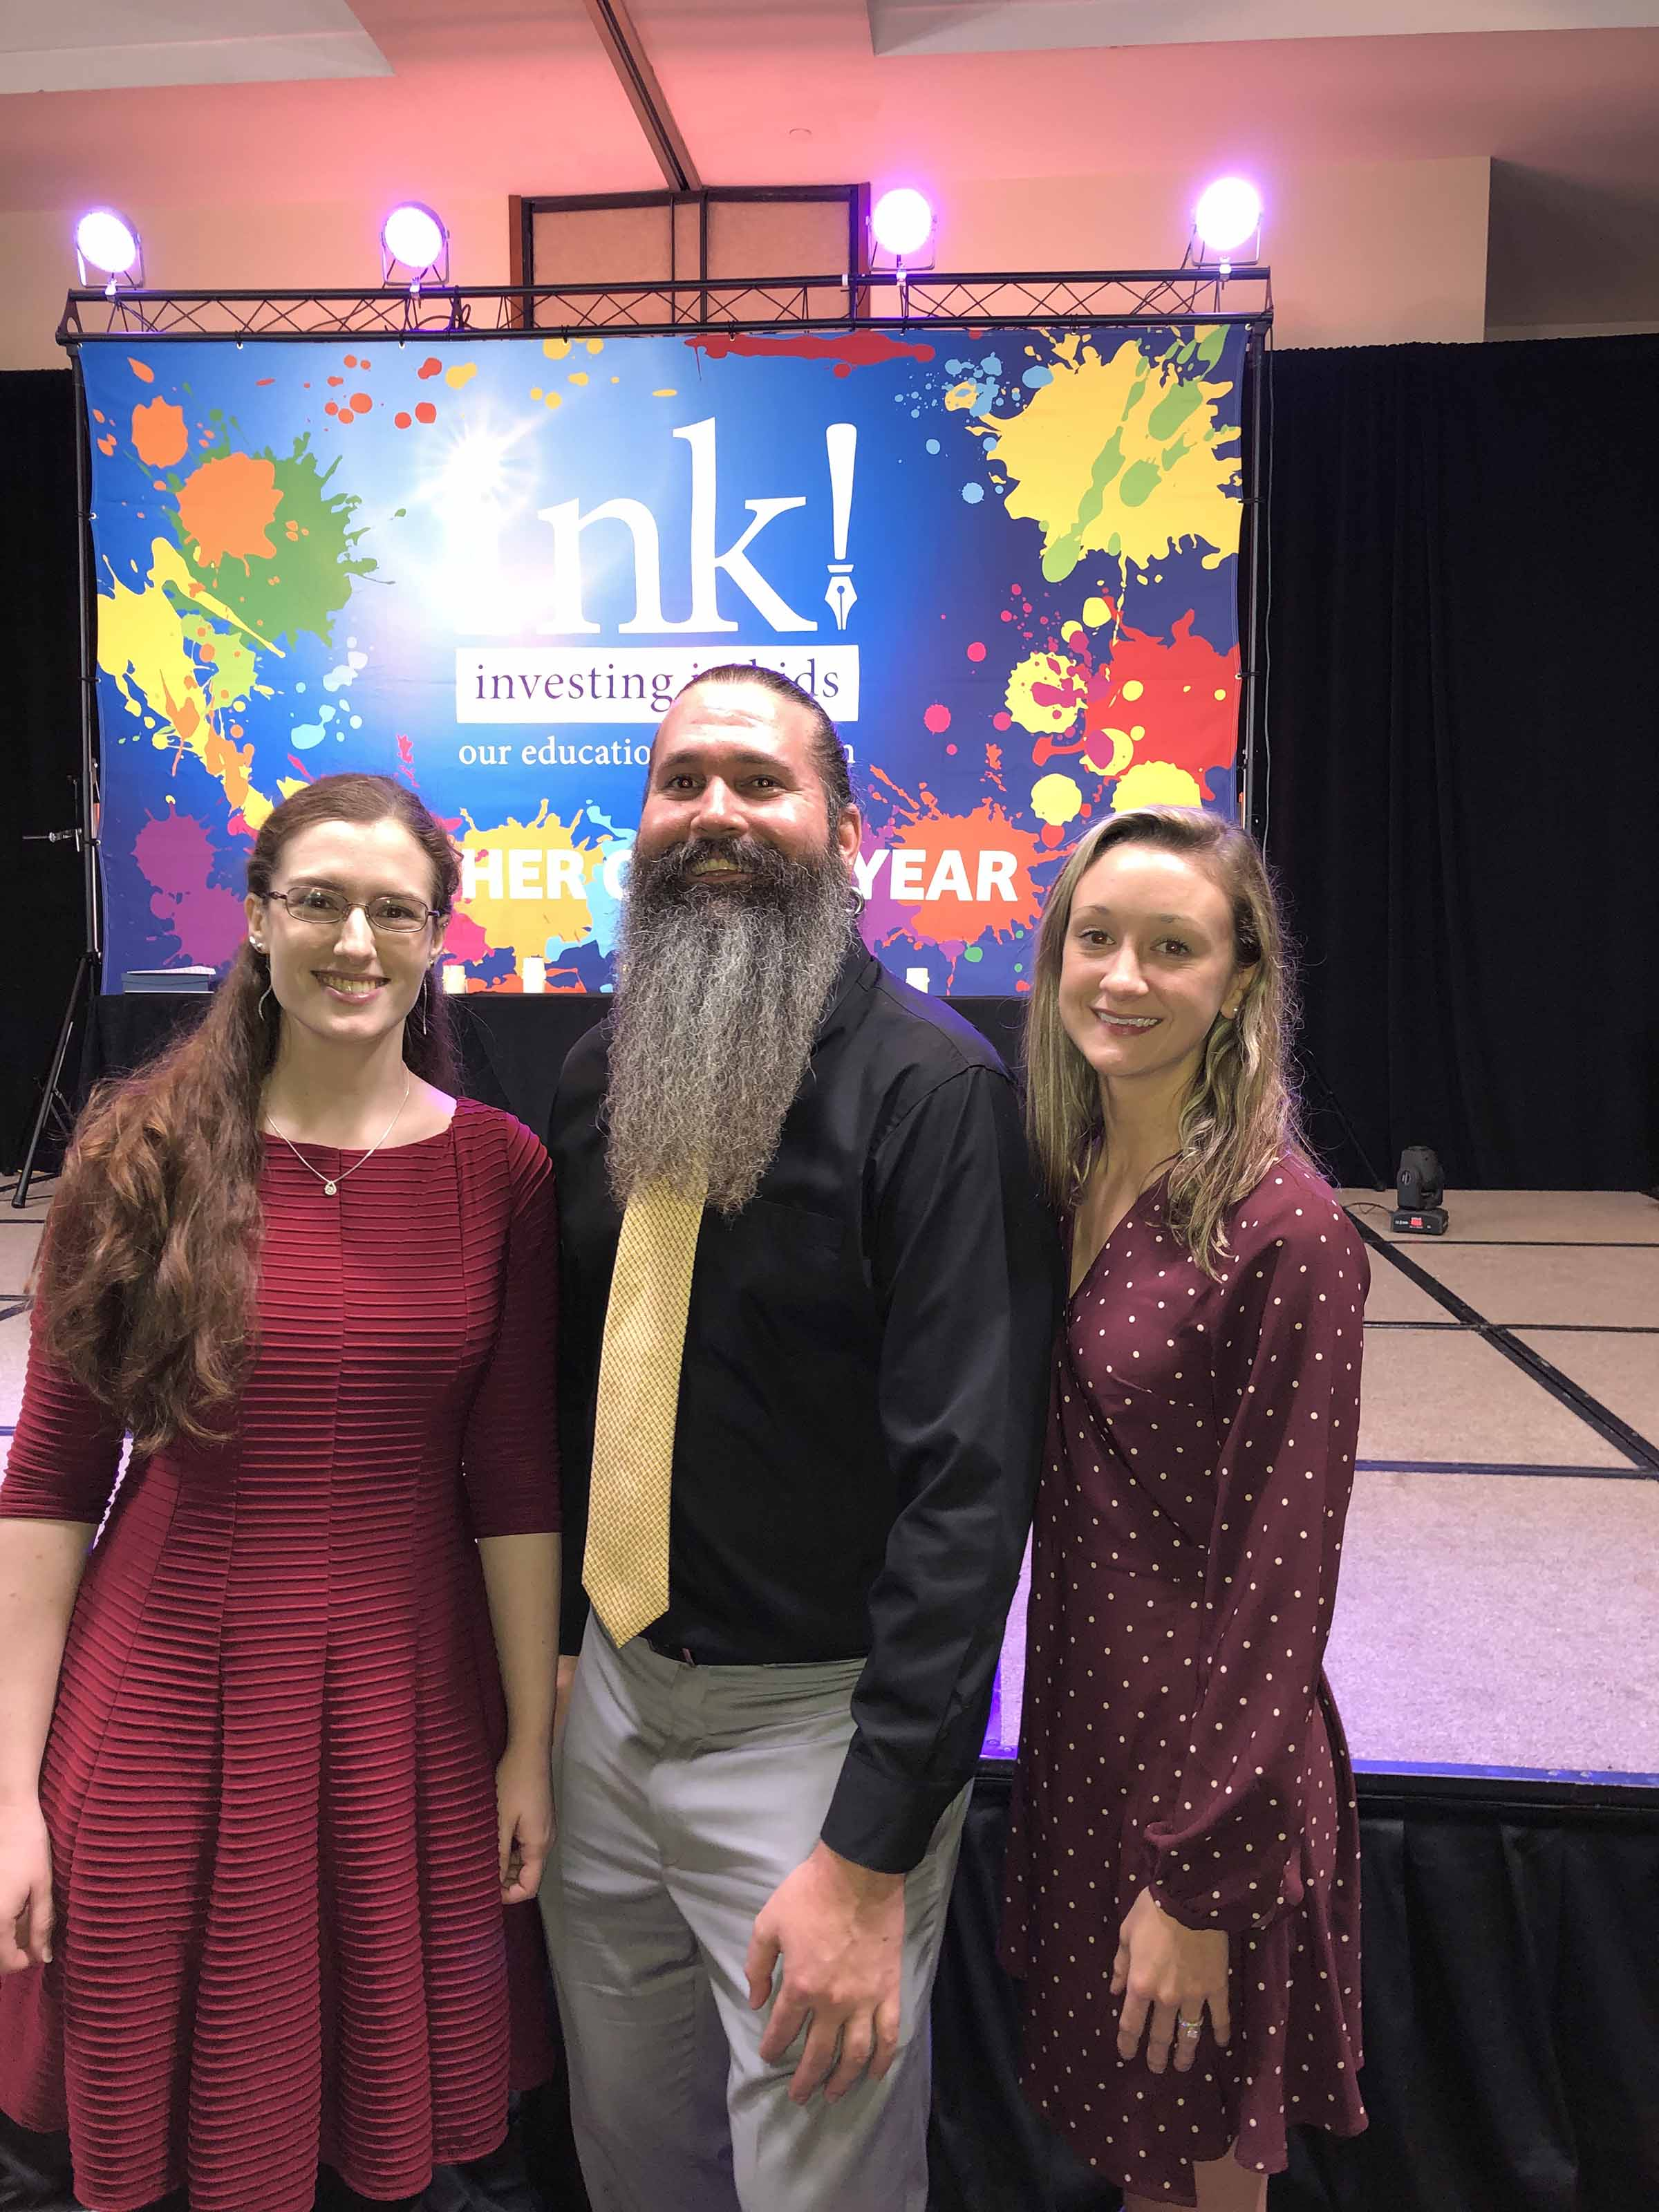 Three team members smiling at Ink Investing in Kids